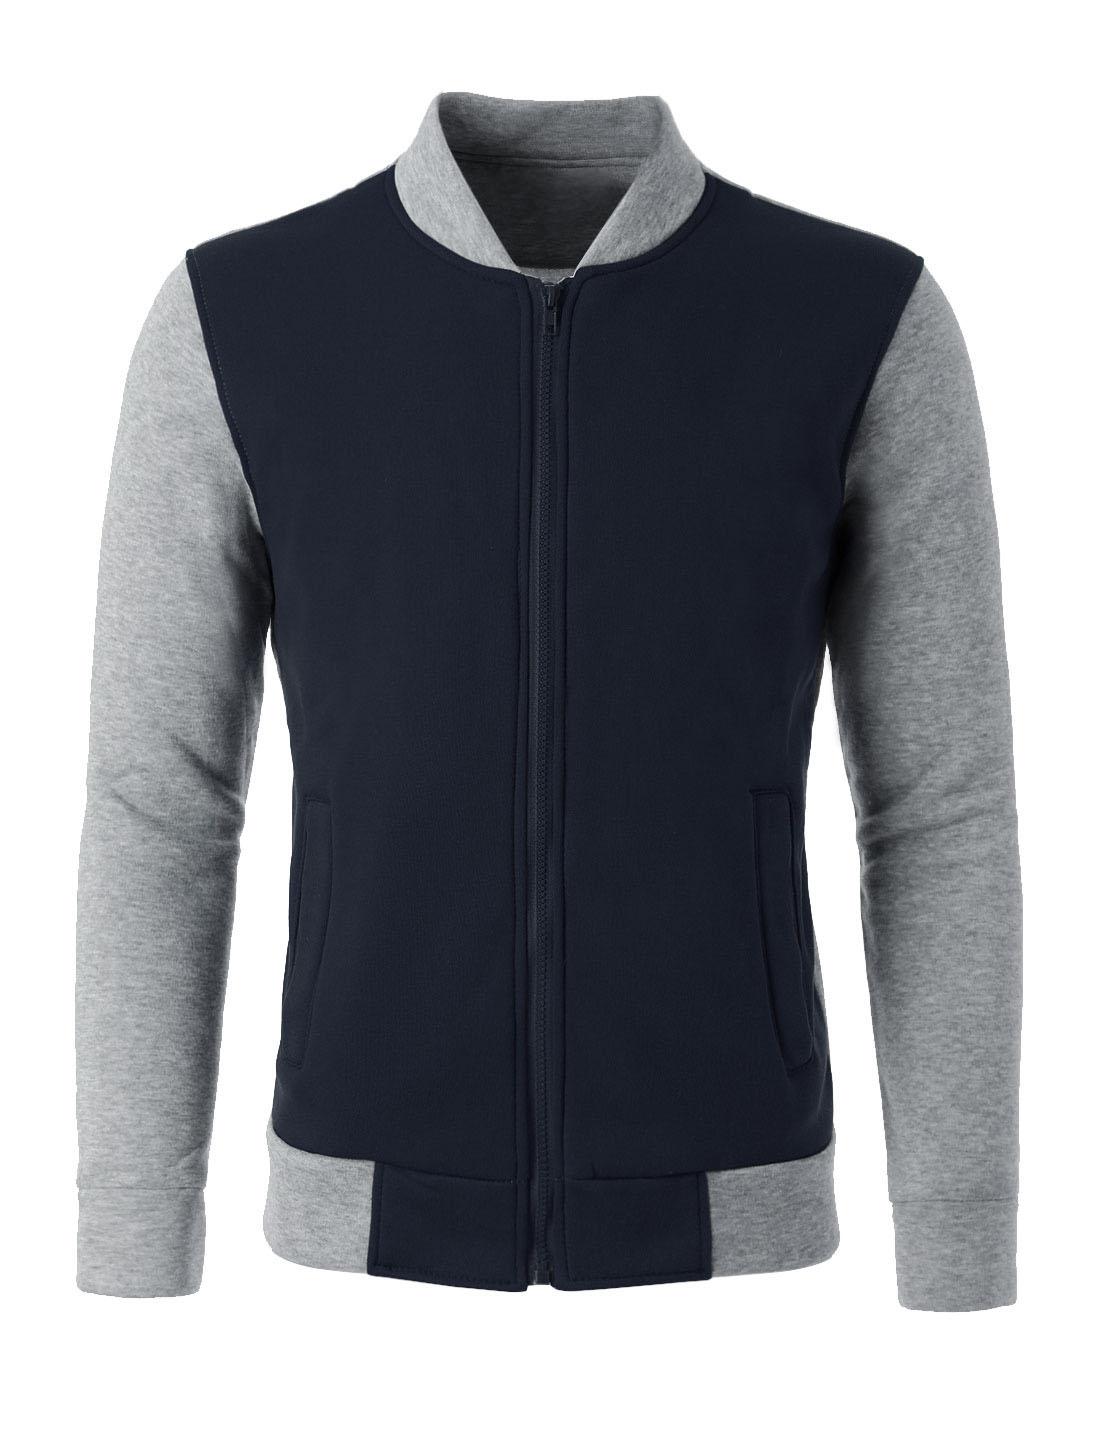 Men Color Block Long Sleeve Zip Up Casual Varsity Jacket Navy Blue Gray M